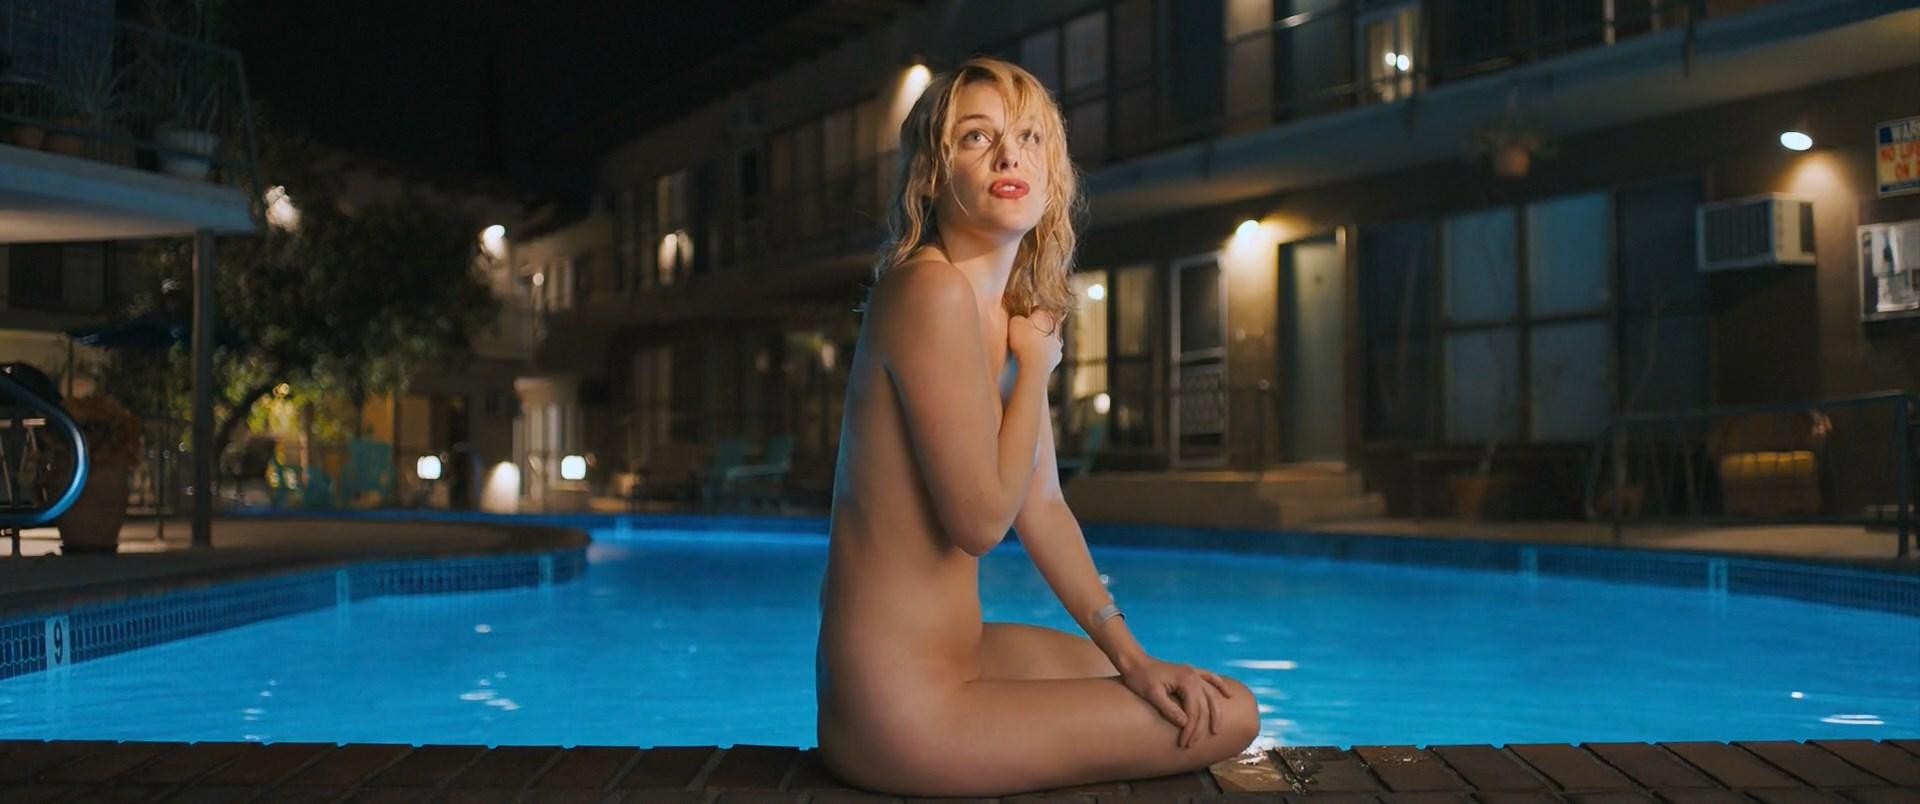 Has Keira Knightley ever been nude  Nude Celebrities